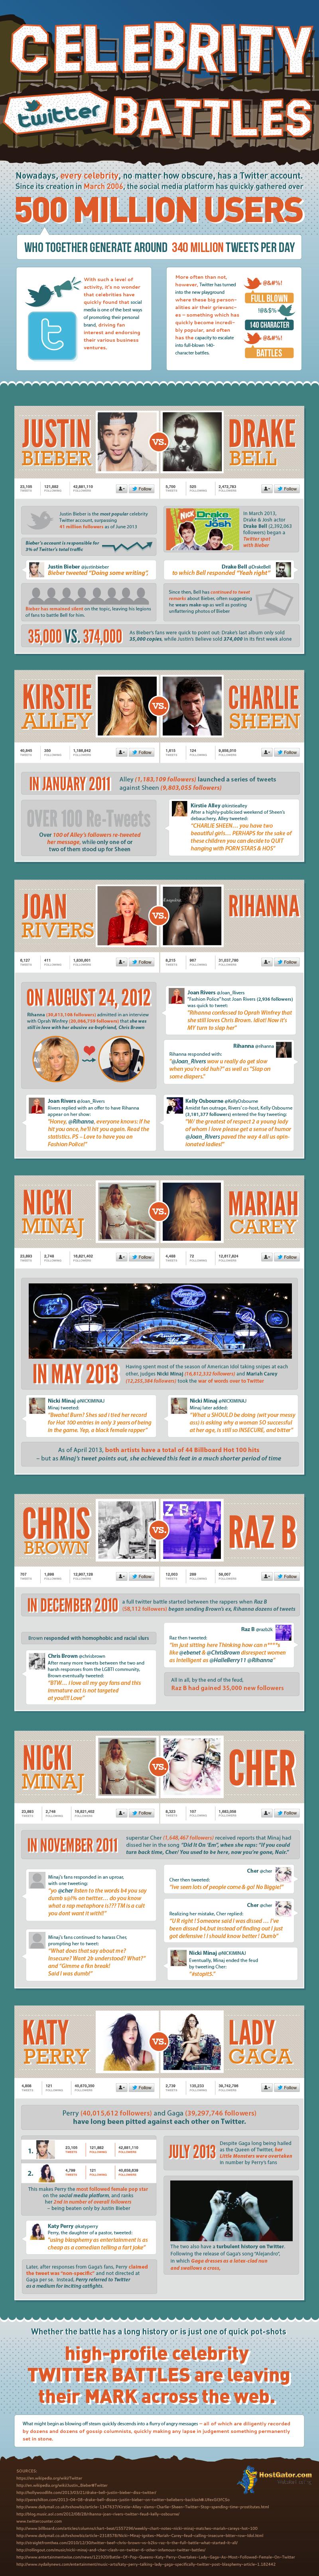 Celebrity-Twitter-Fights